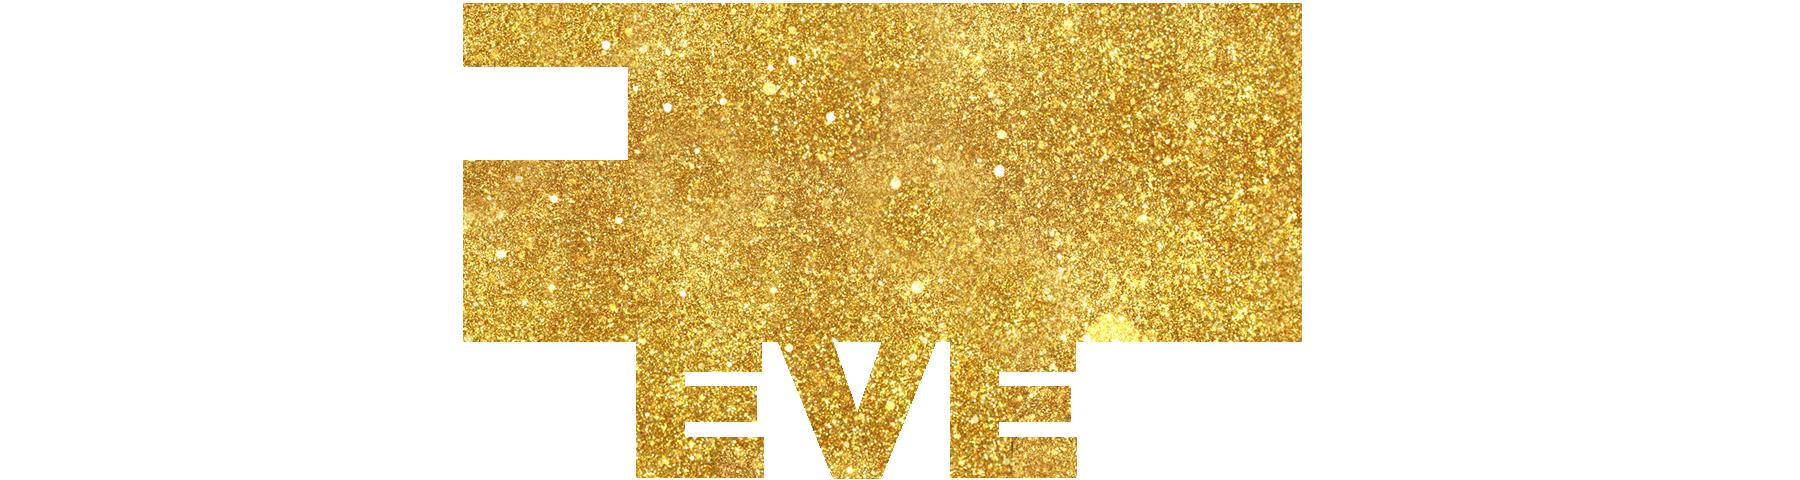 new years eve with steve harvey